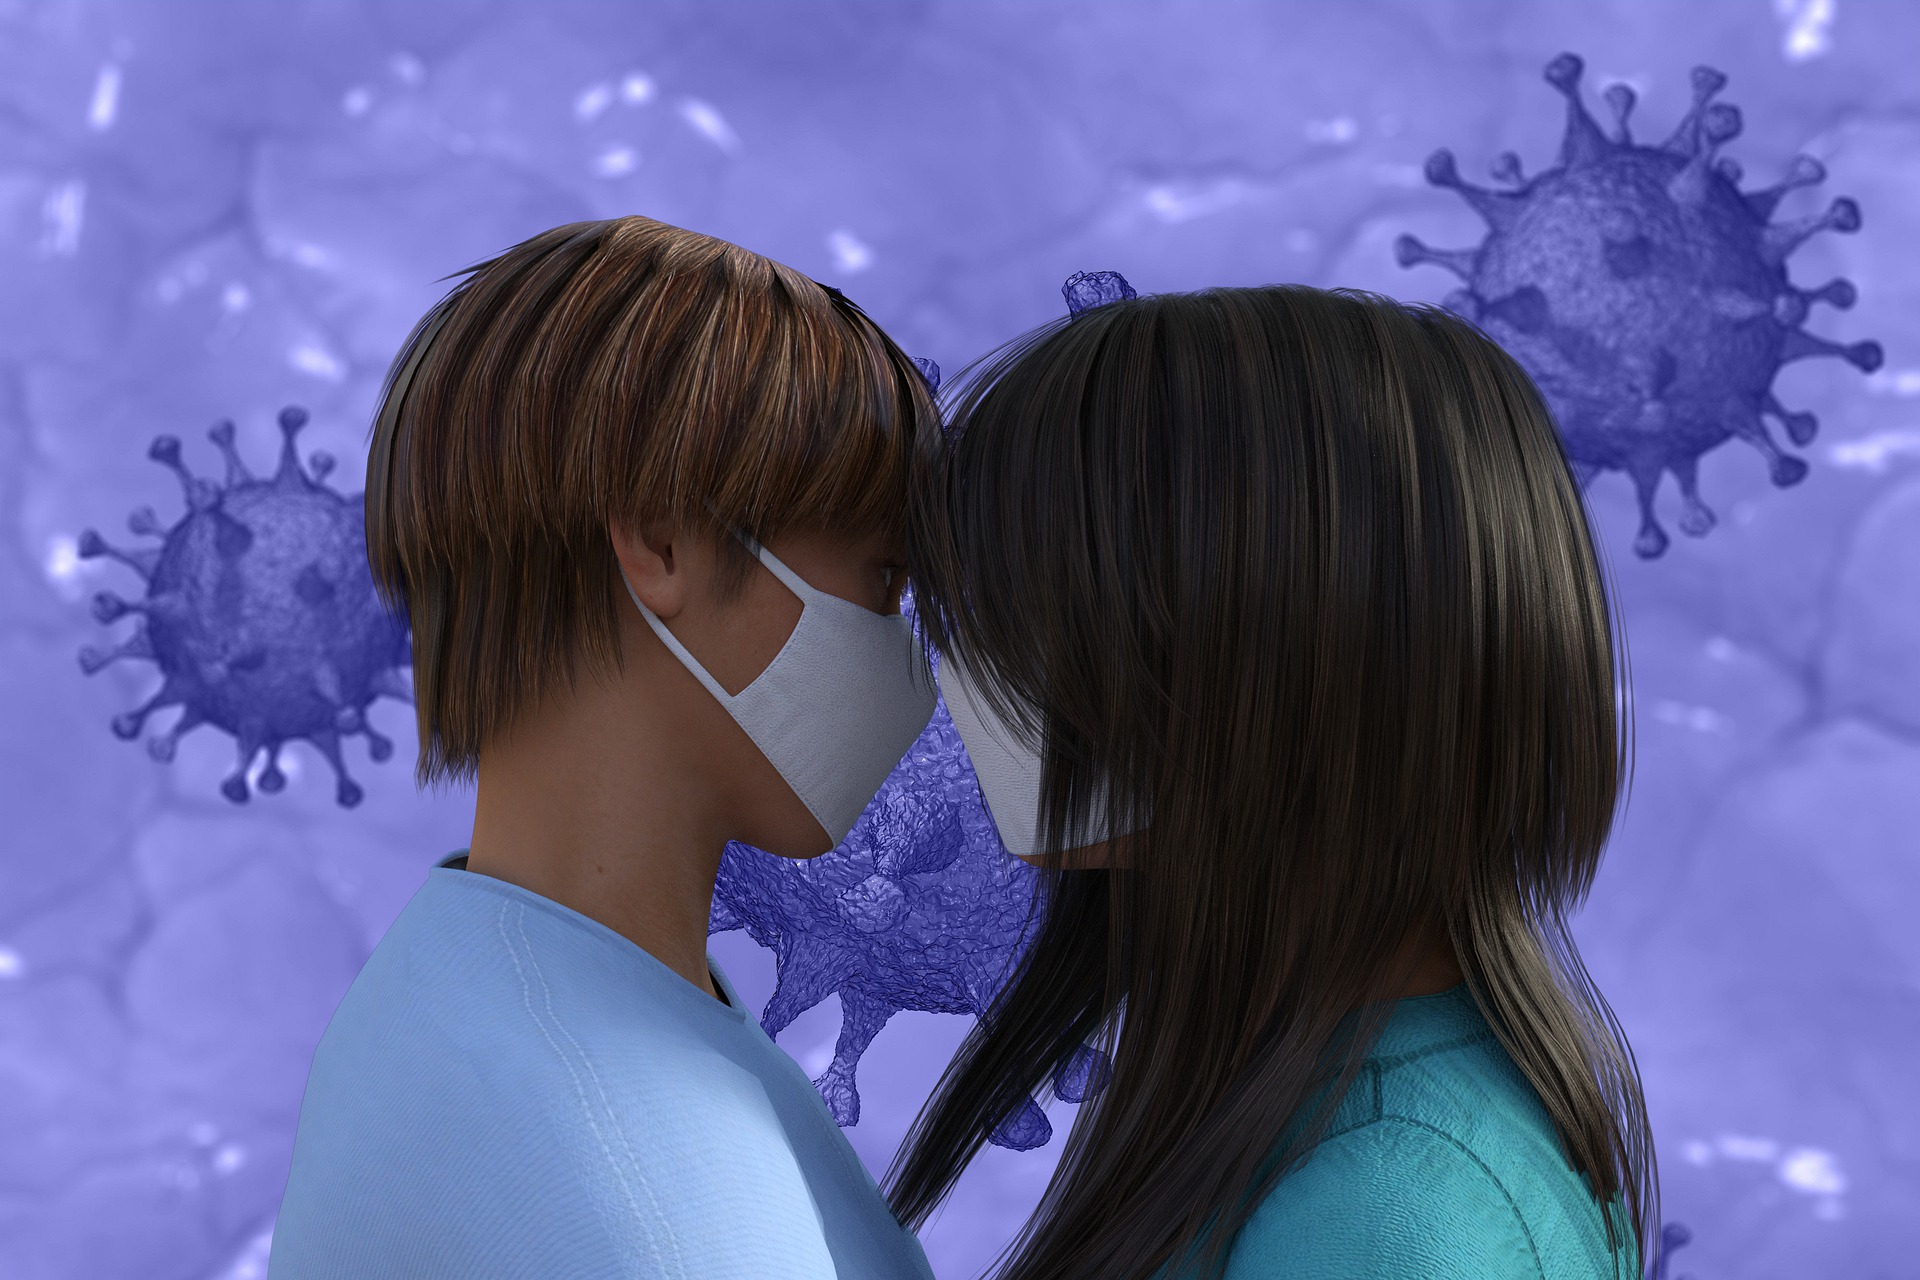 coppia amore mascherina covid coronavirus